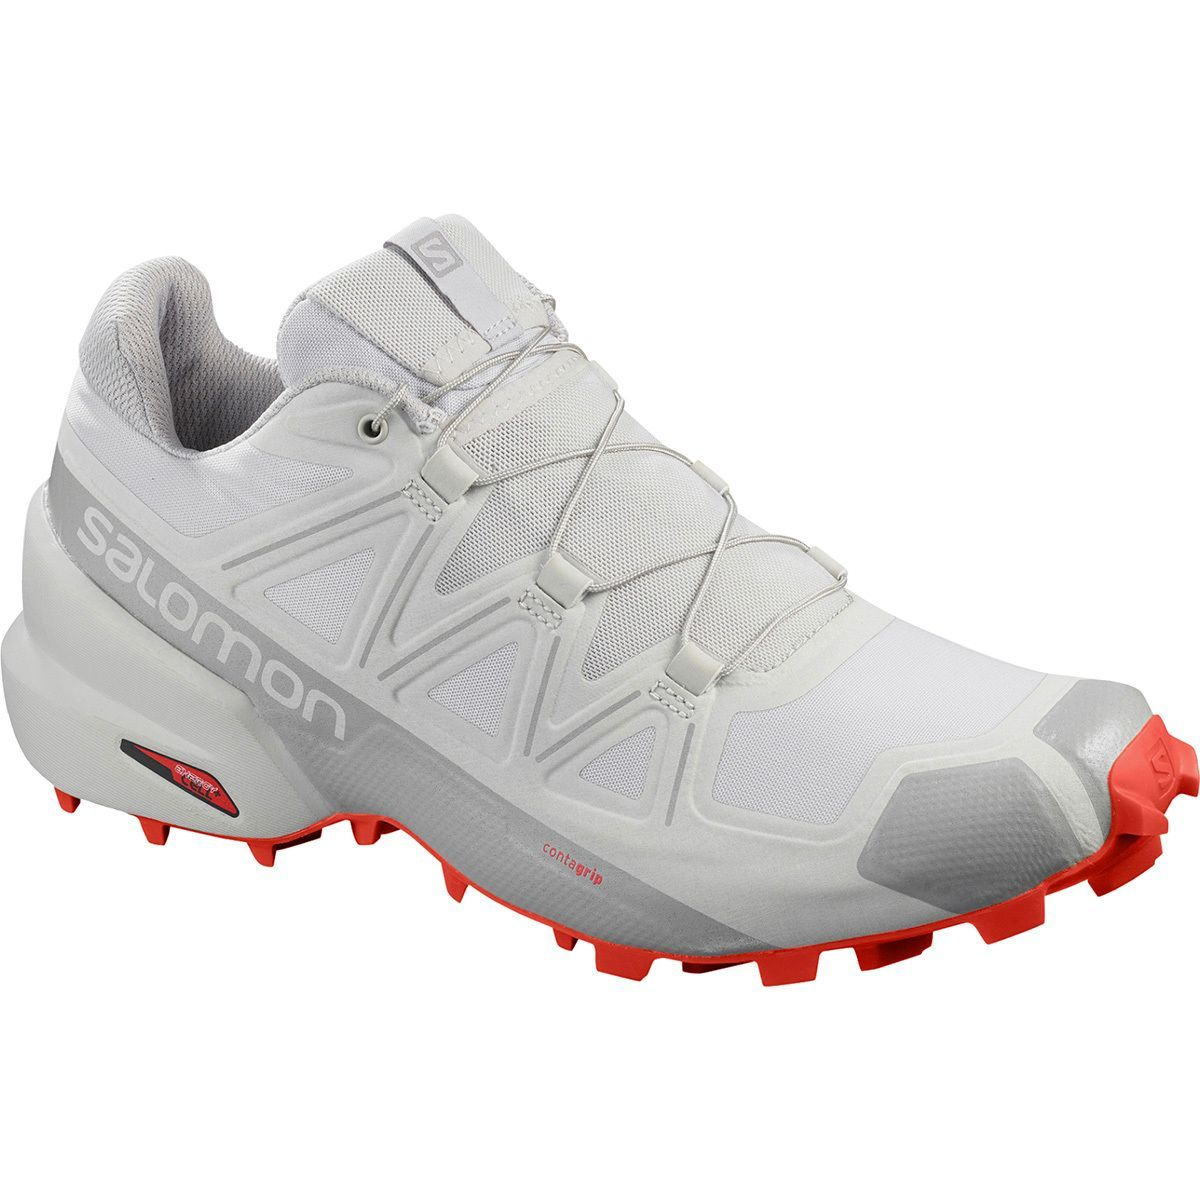 Speedcross 5 Trail Running Shoe Men S In 2020 Mens Trail Running Shoes Trail Running Shoes Mens Boots Fashion